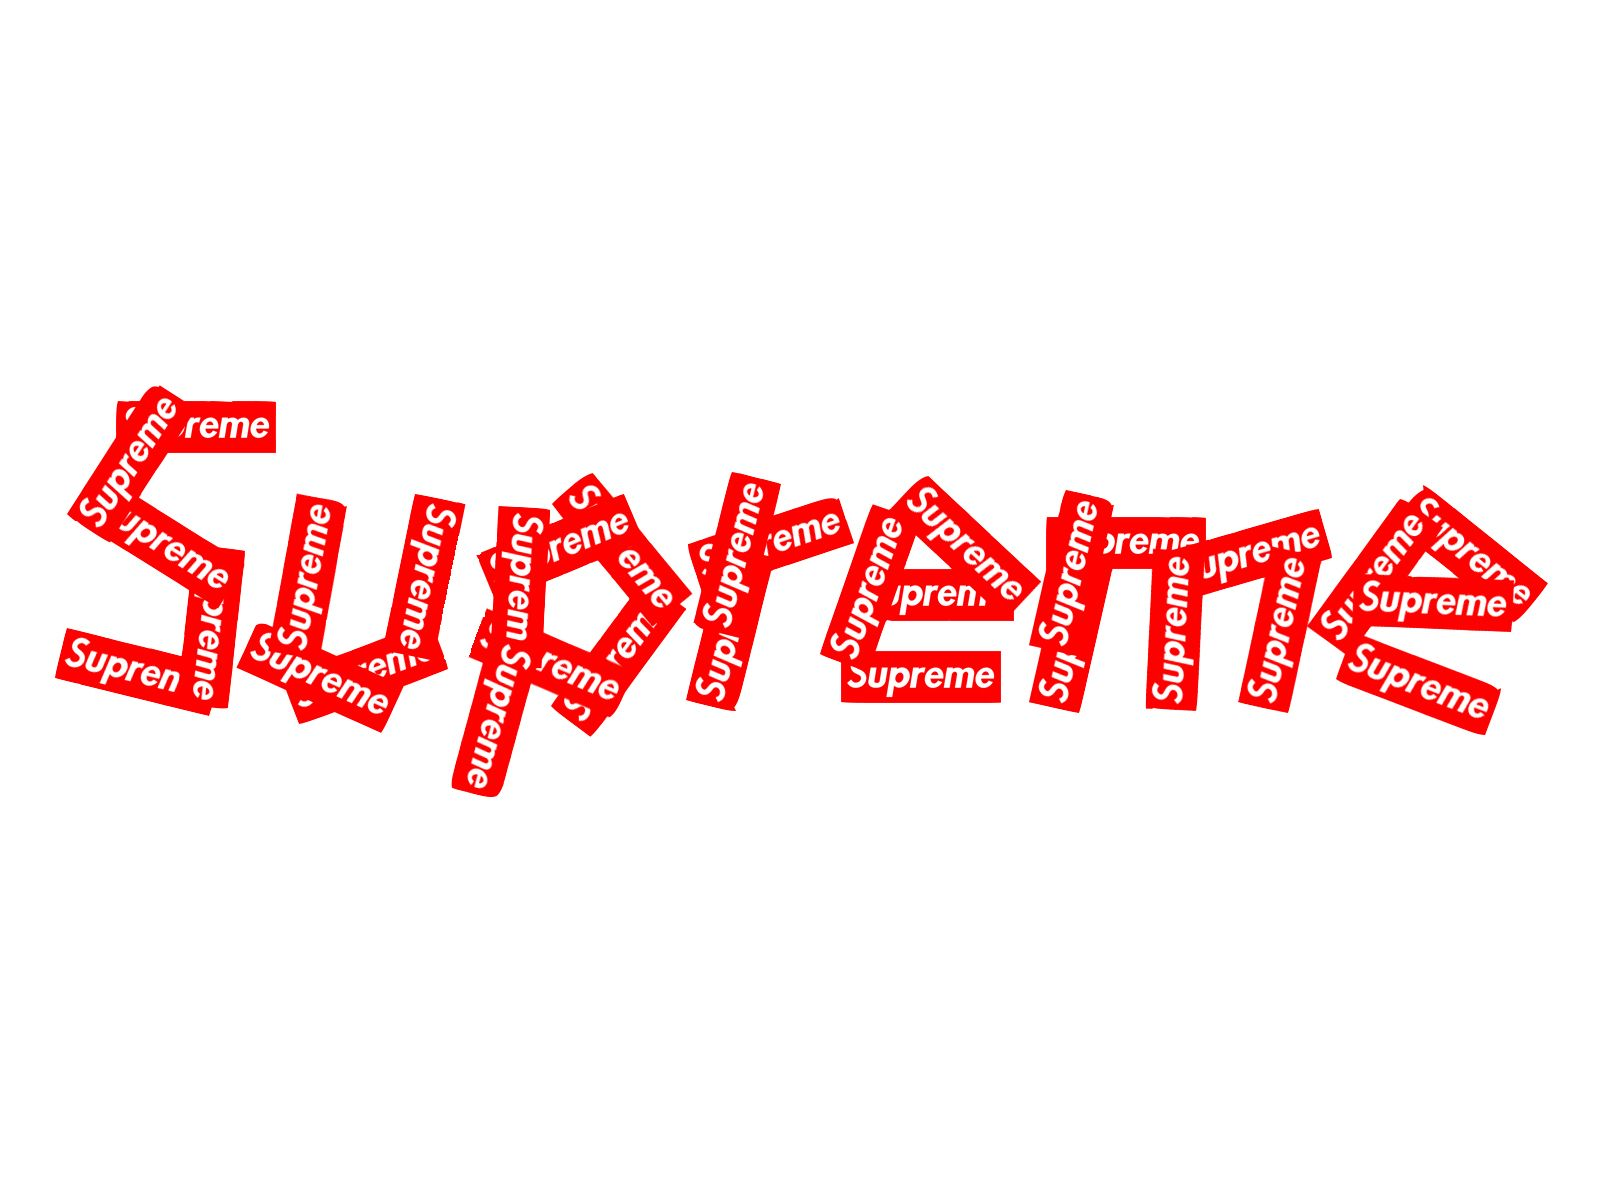 HD Supreme Wallpapers Live Supreme Wallpapers HY WP HD 1600x1200